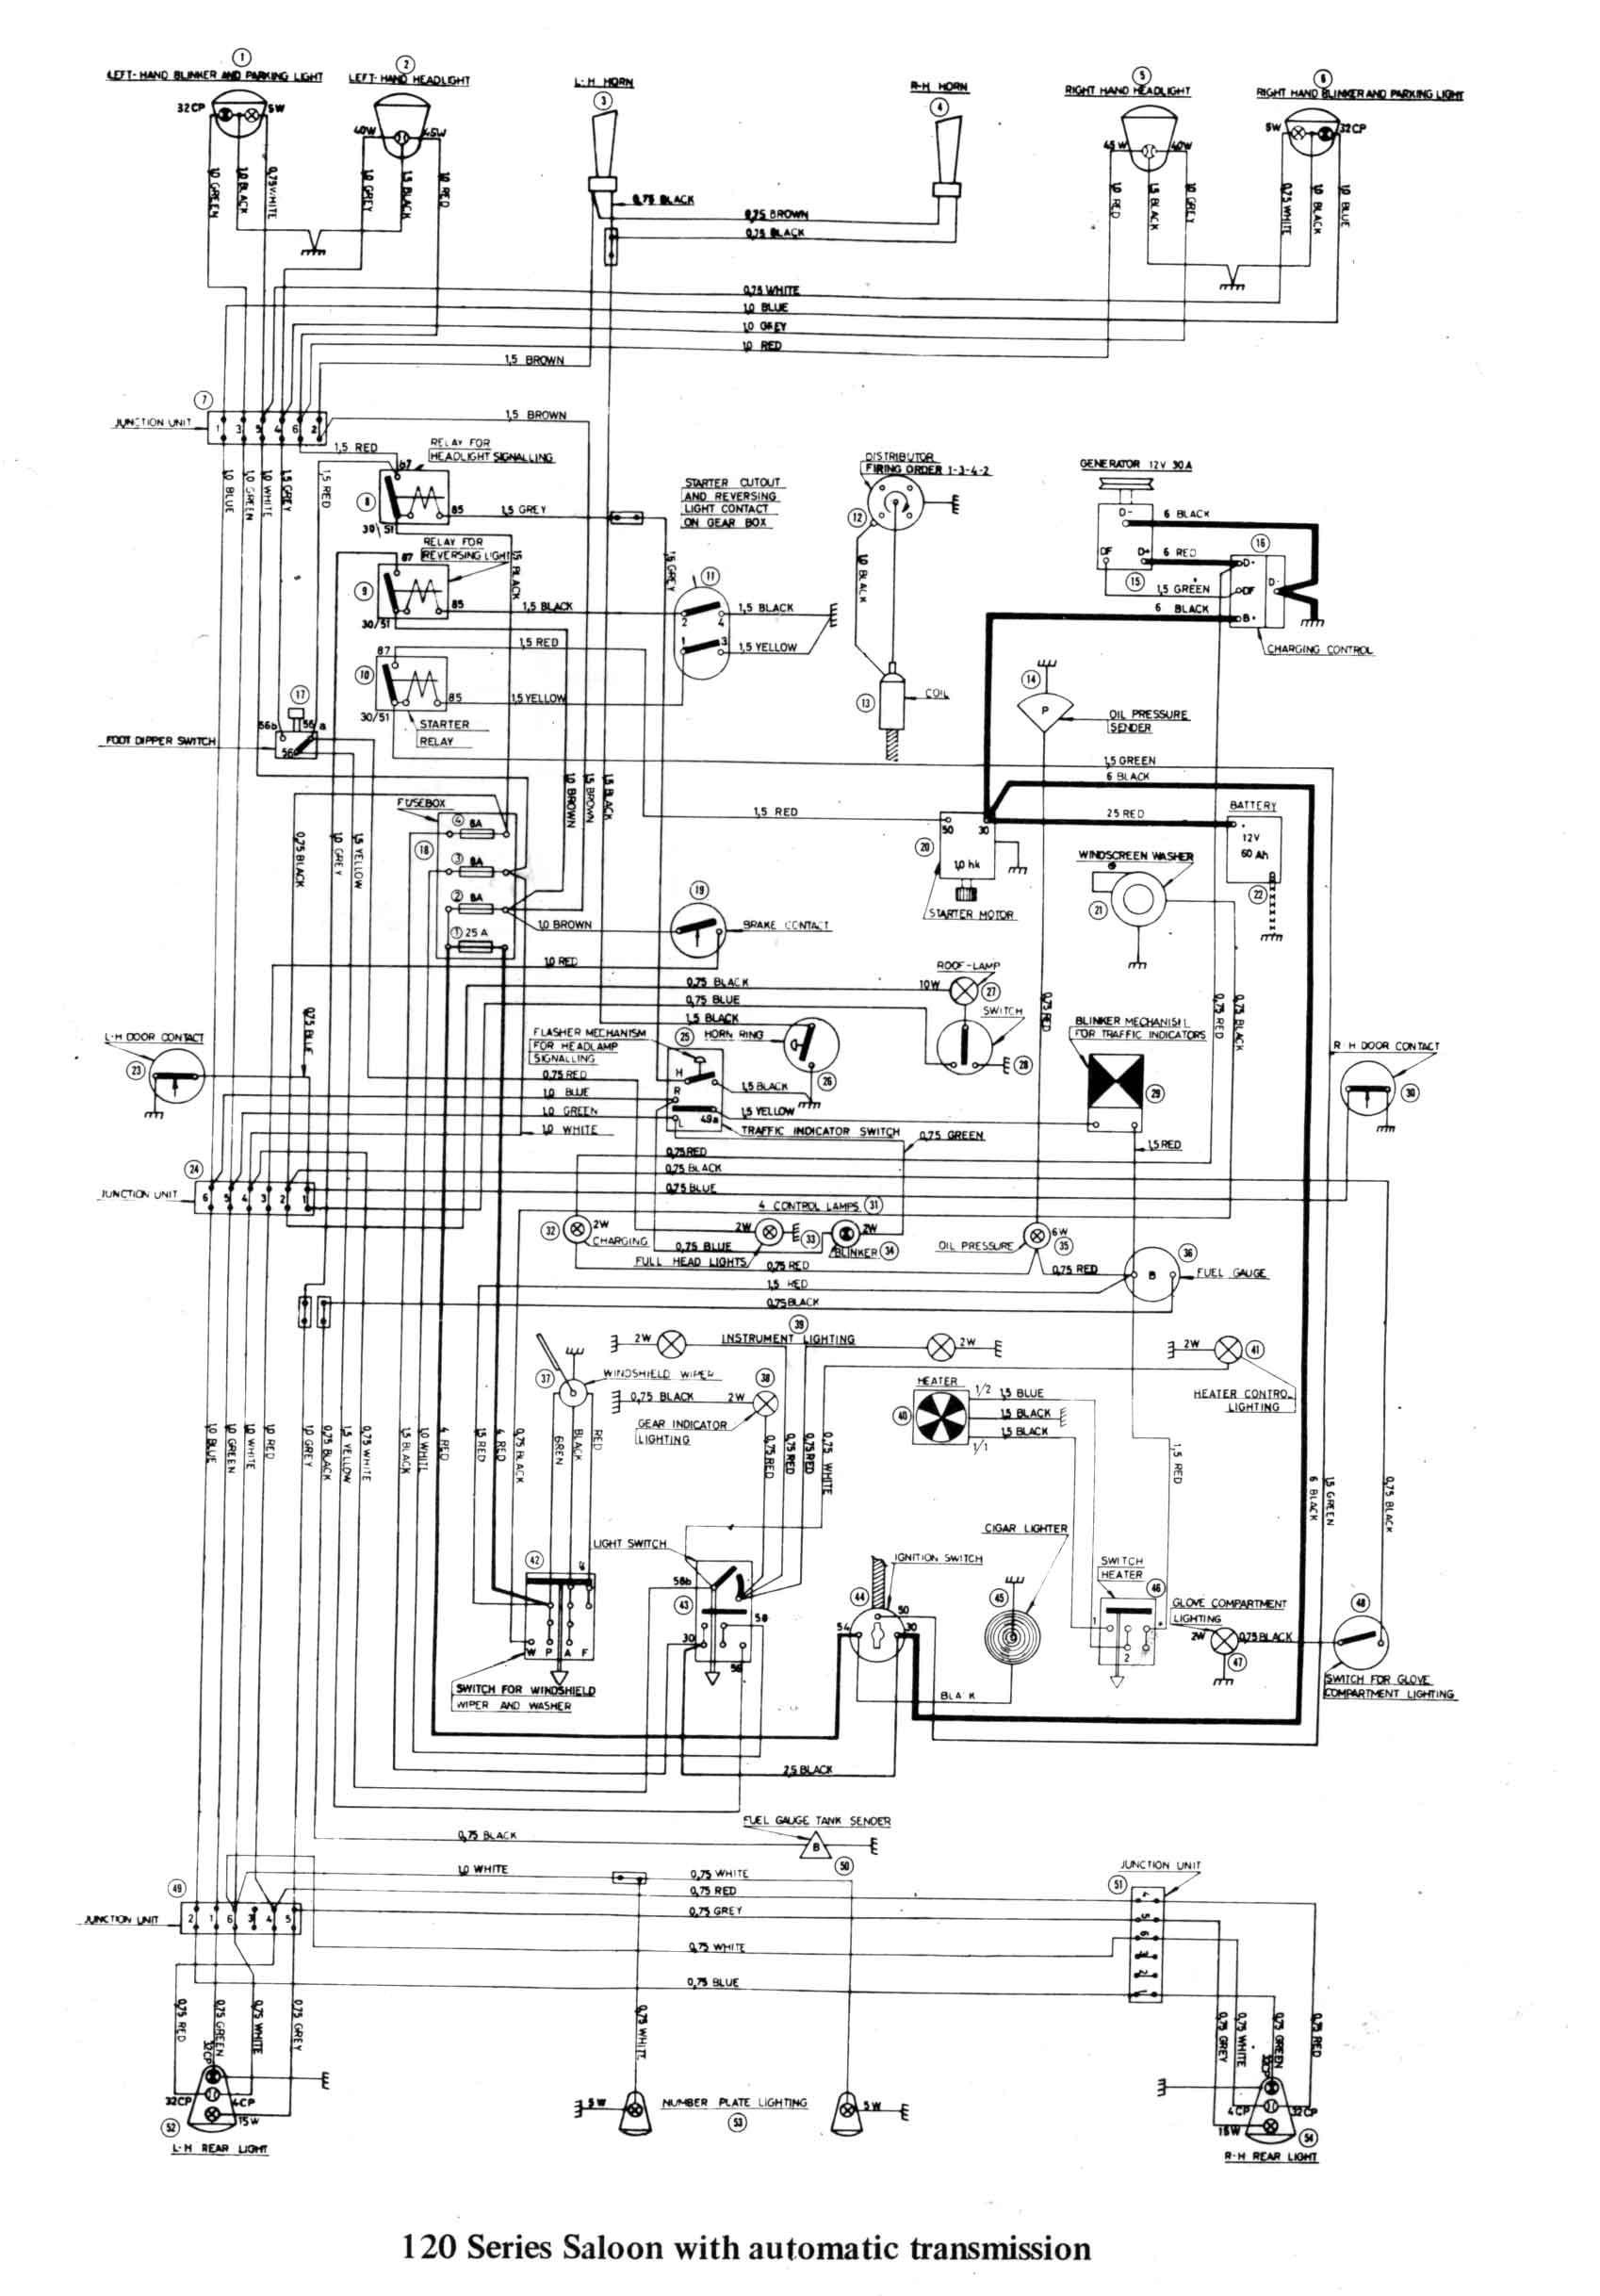 Manual Gearbox Diagram Sw Em Od Retrofitting On A Vintage Volvo Of Manual Gearbox Diagram